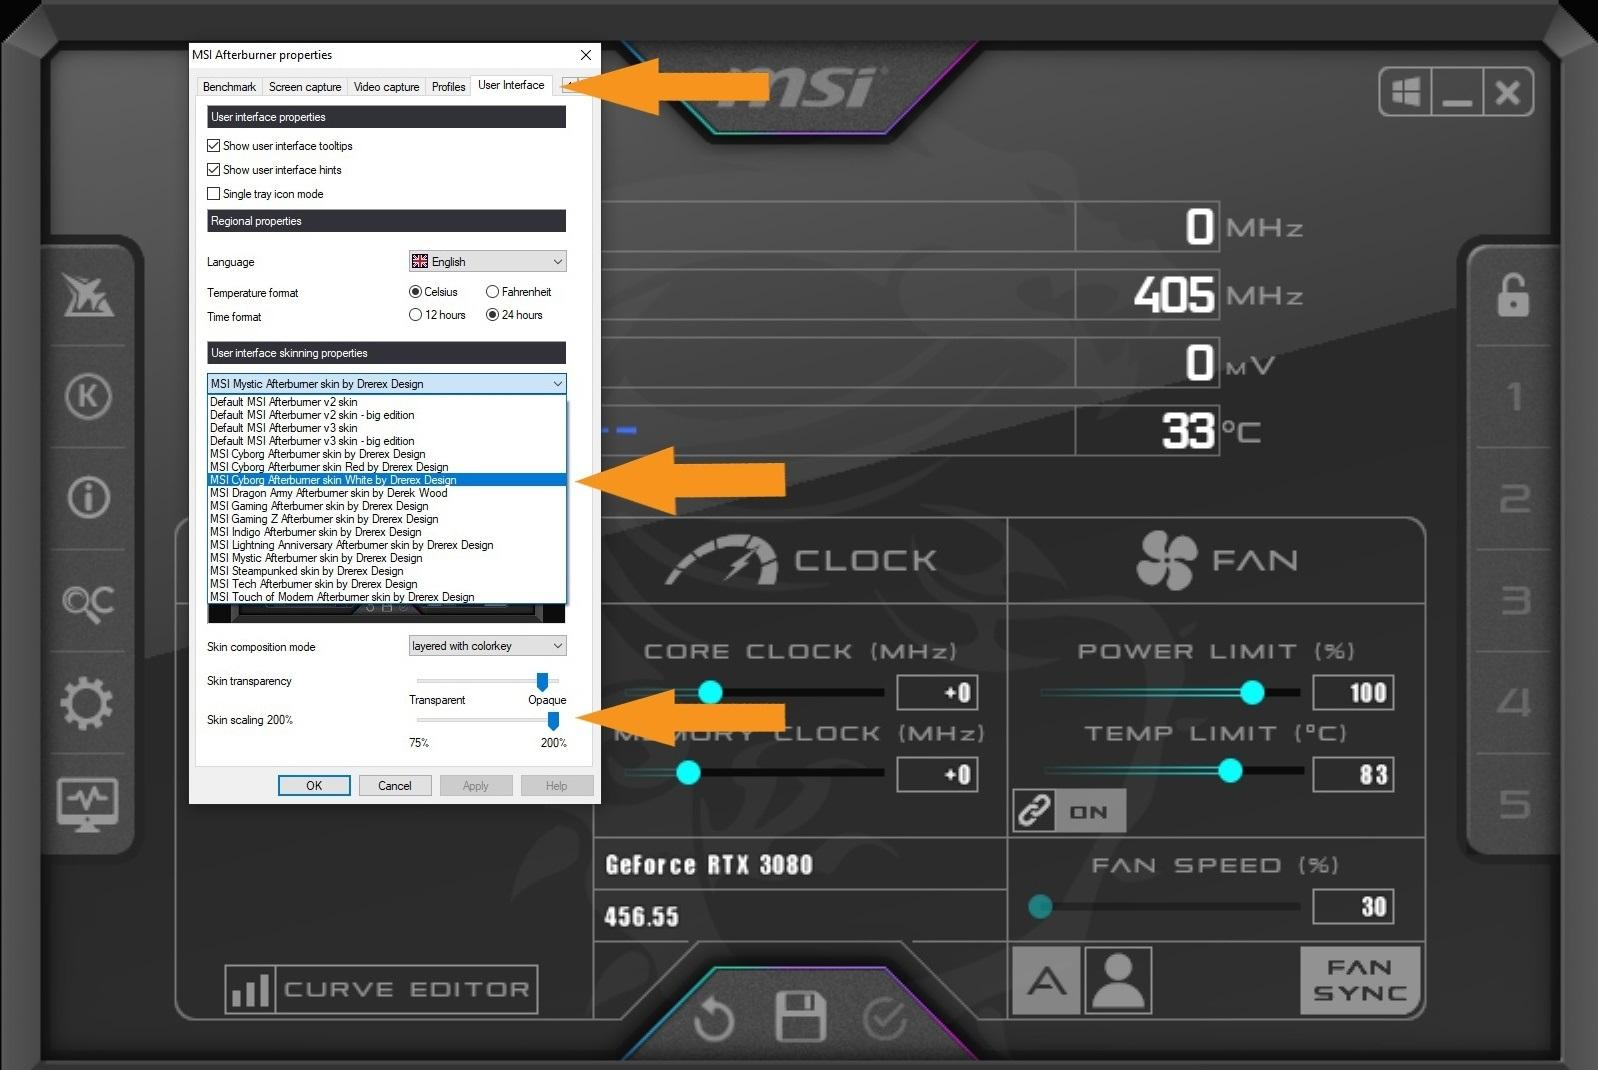 Nvidia Geforce Rtx 3080 Guide Overclocking Msi After Burner Skin Cyborg 200